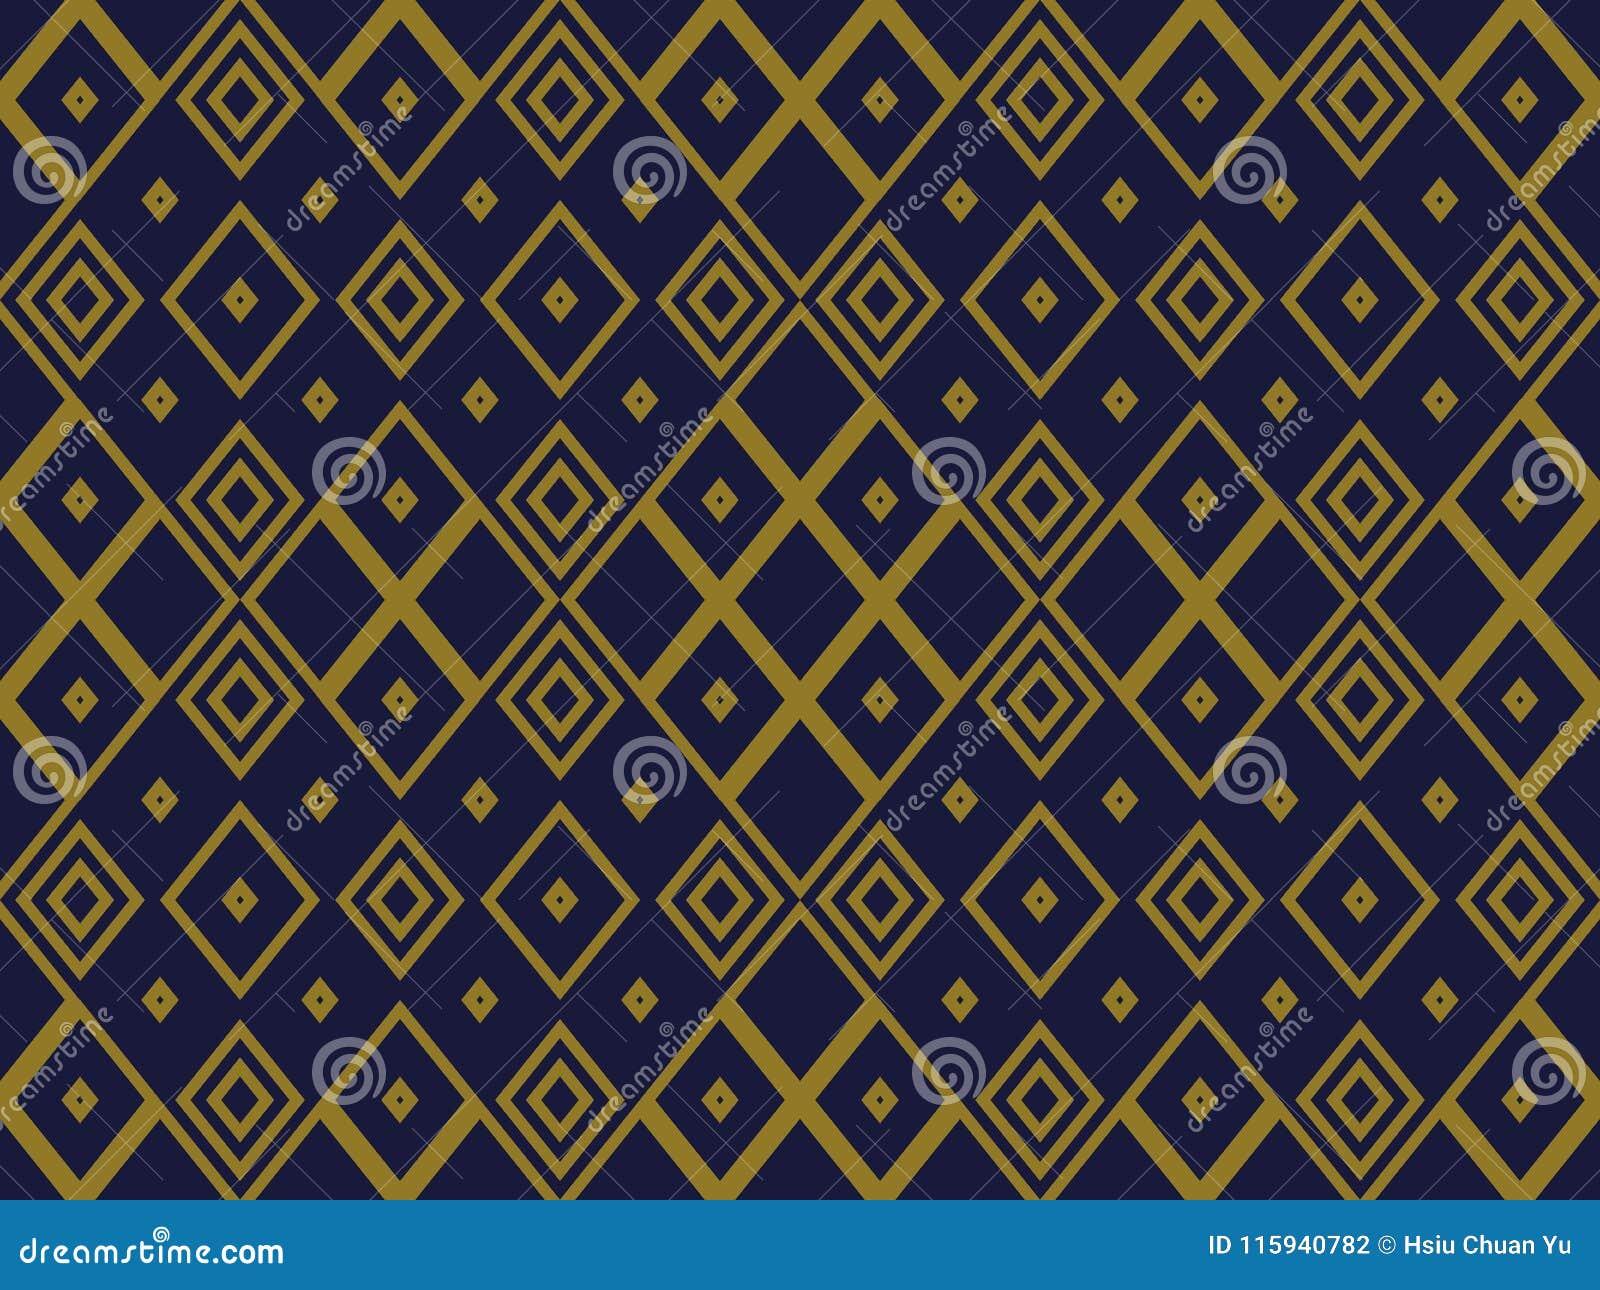 Fondo senza cuciture antico Diamond Check Cross Rhomb Geometry